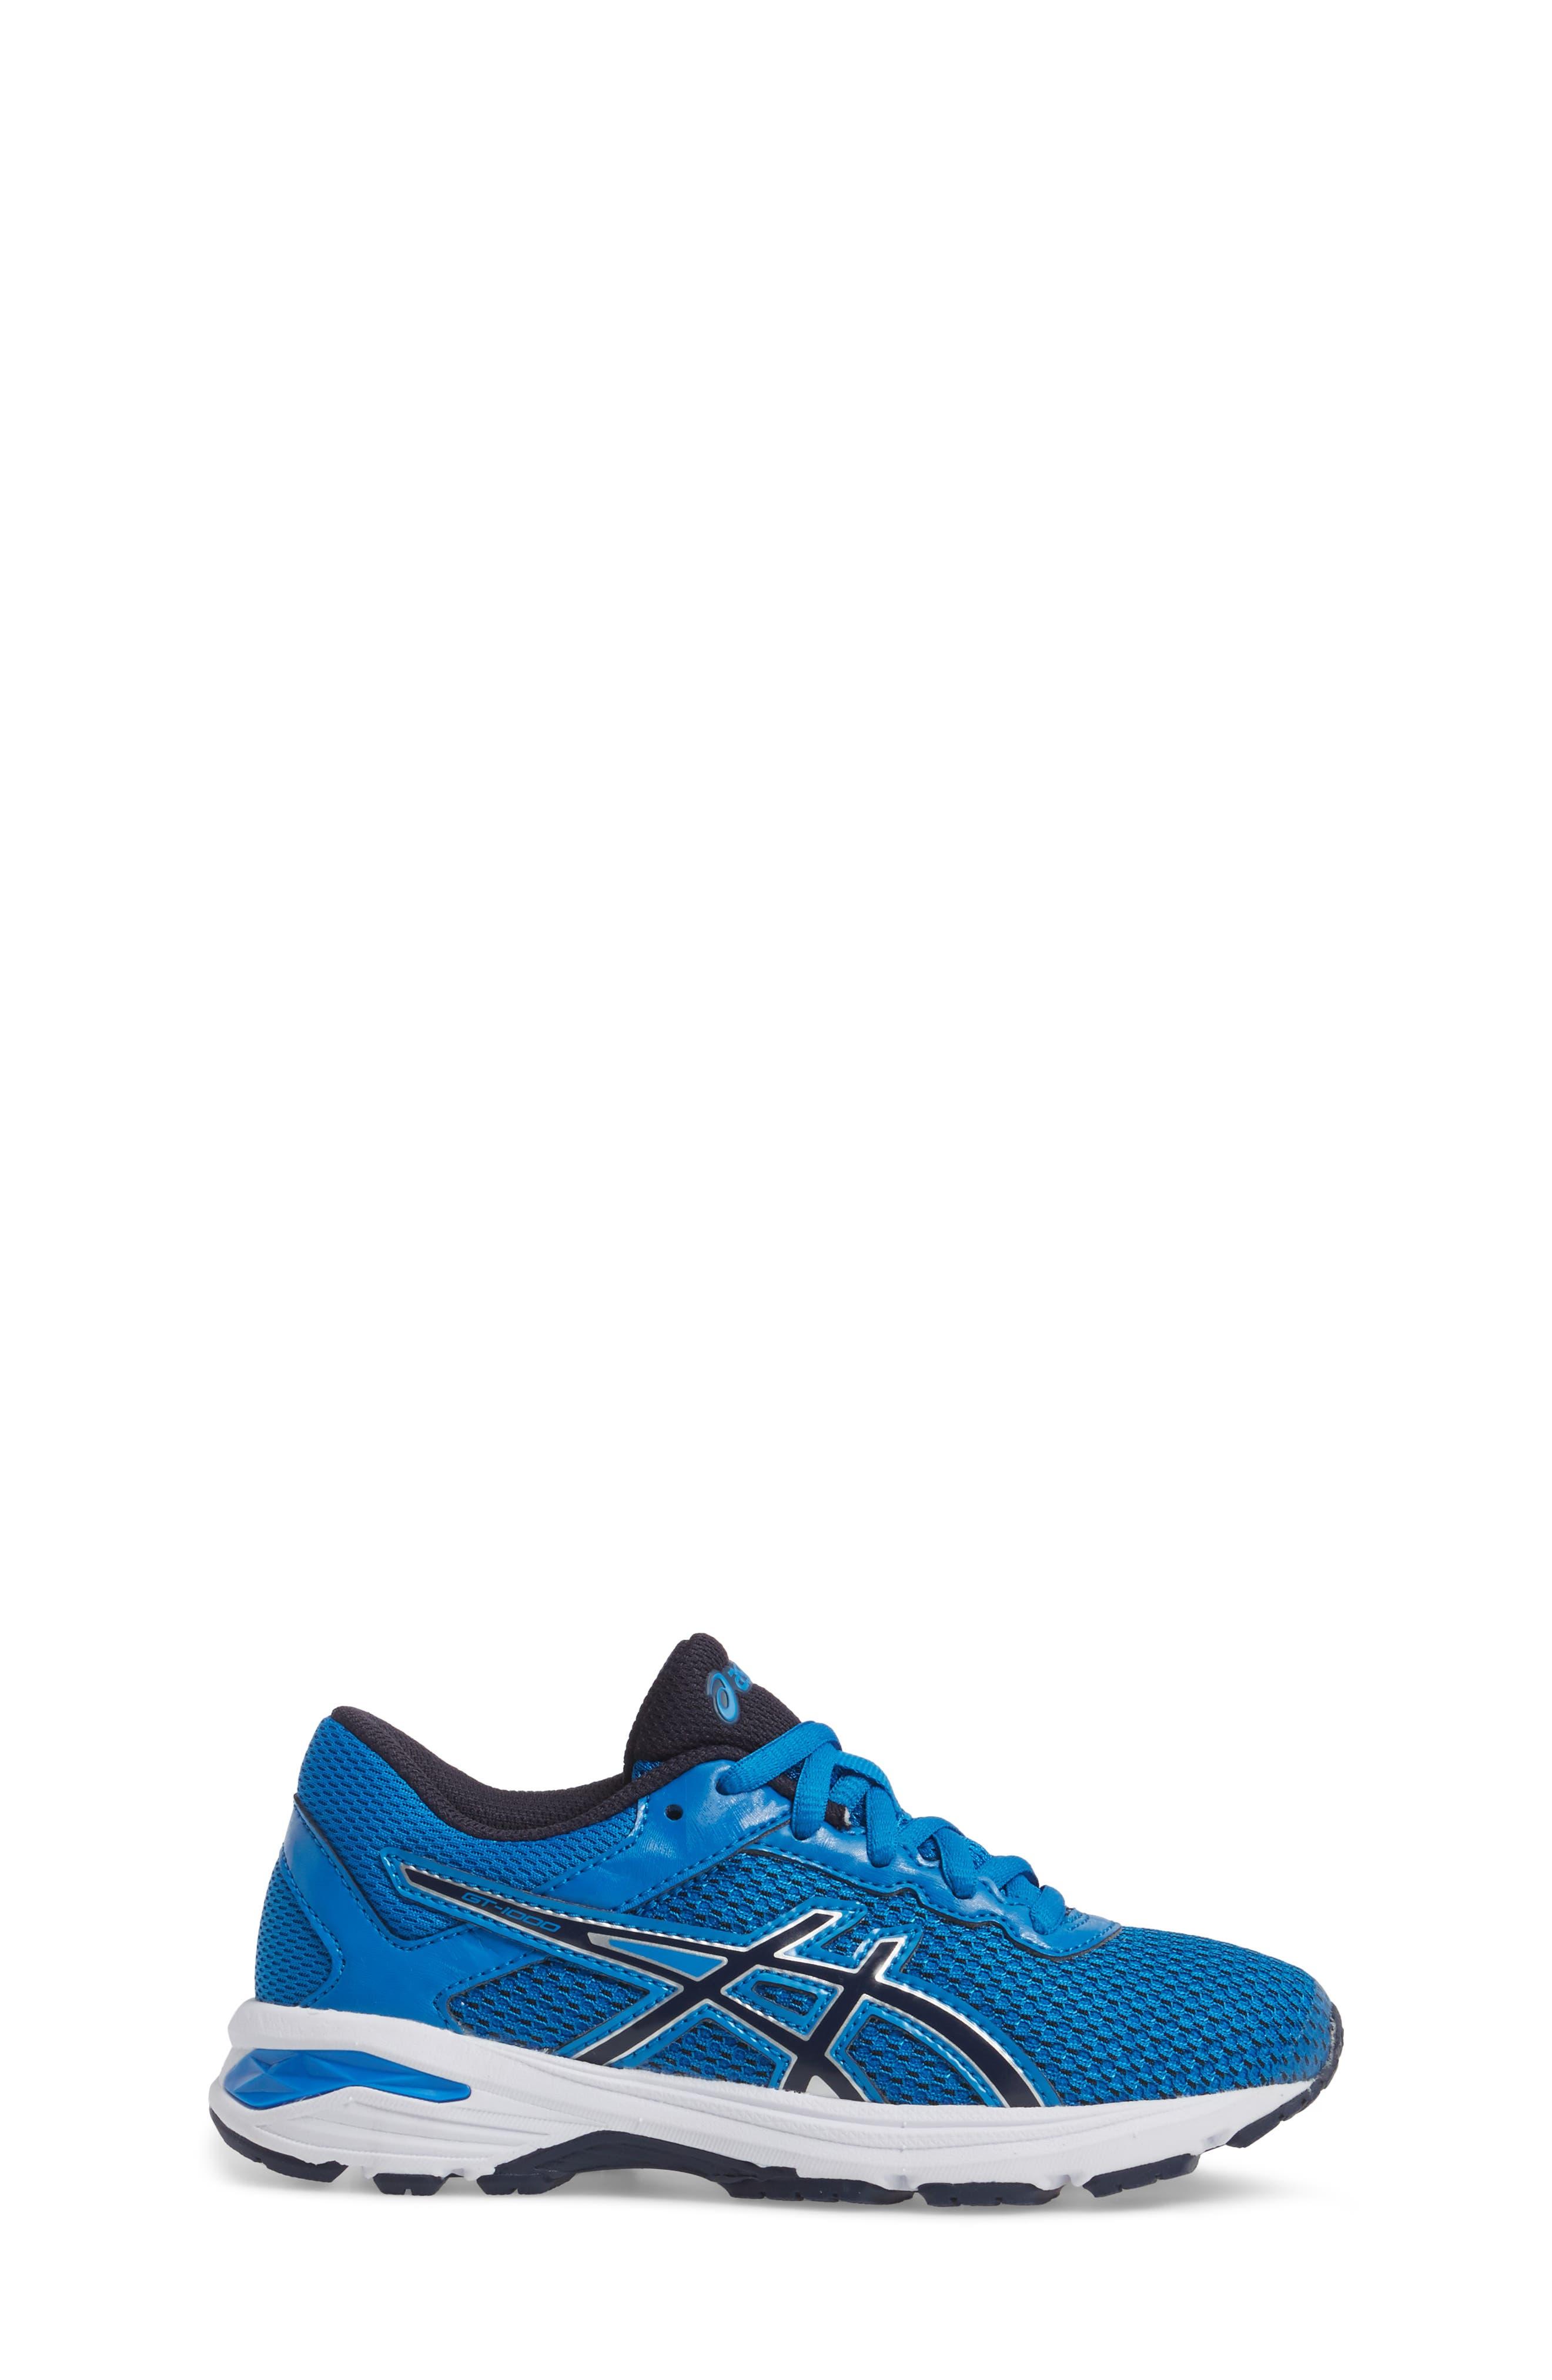 Asics GT-1000<sup>™</sup> 6 GS Sneaker,                             Alternate thumbnail 3, color,                             Blue/ Peacock